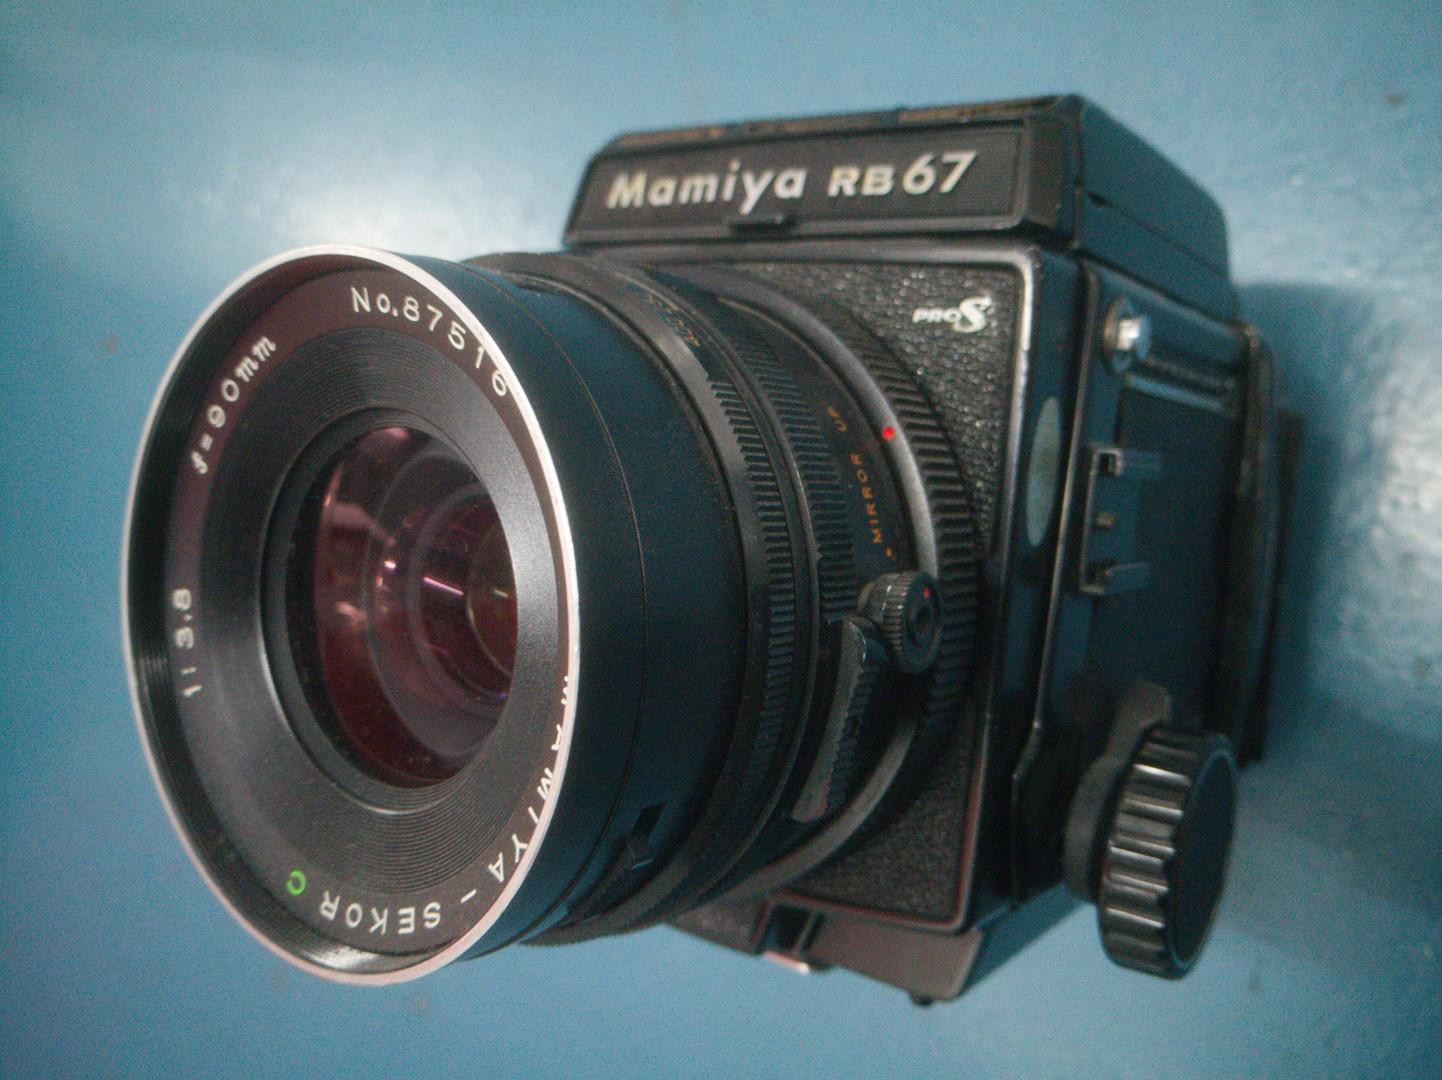 Medium Format Film Camera Mamiya